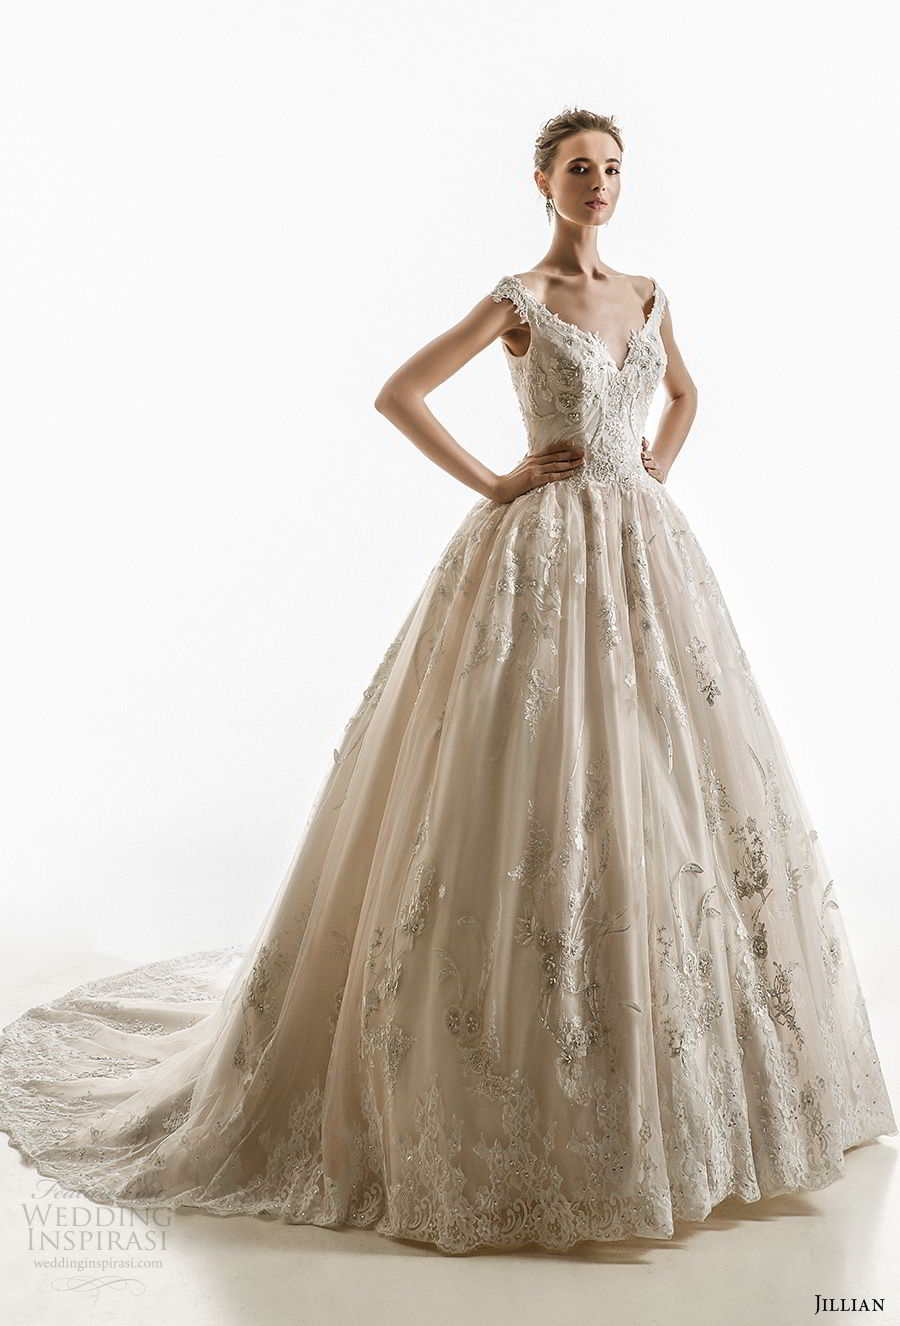 jillian 2018 bridal off the shoulder cap sleeves sweetheart neckline heavily embellished bodice princess ball gown wedding dress corset back chapel train (10) mv